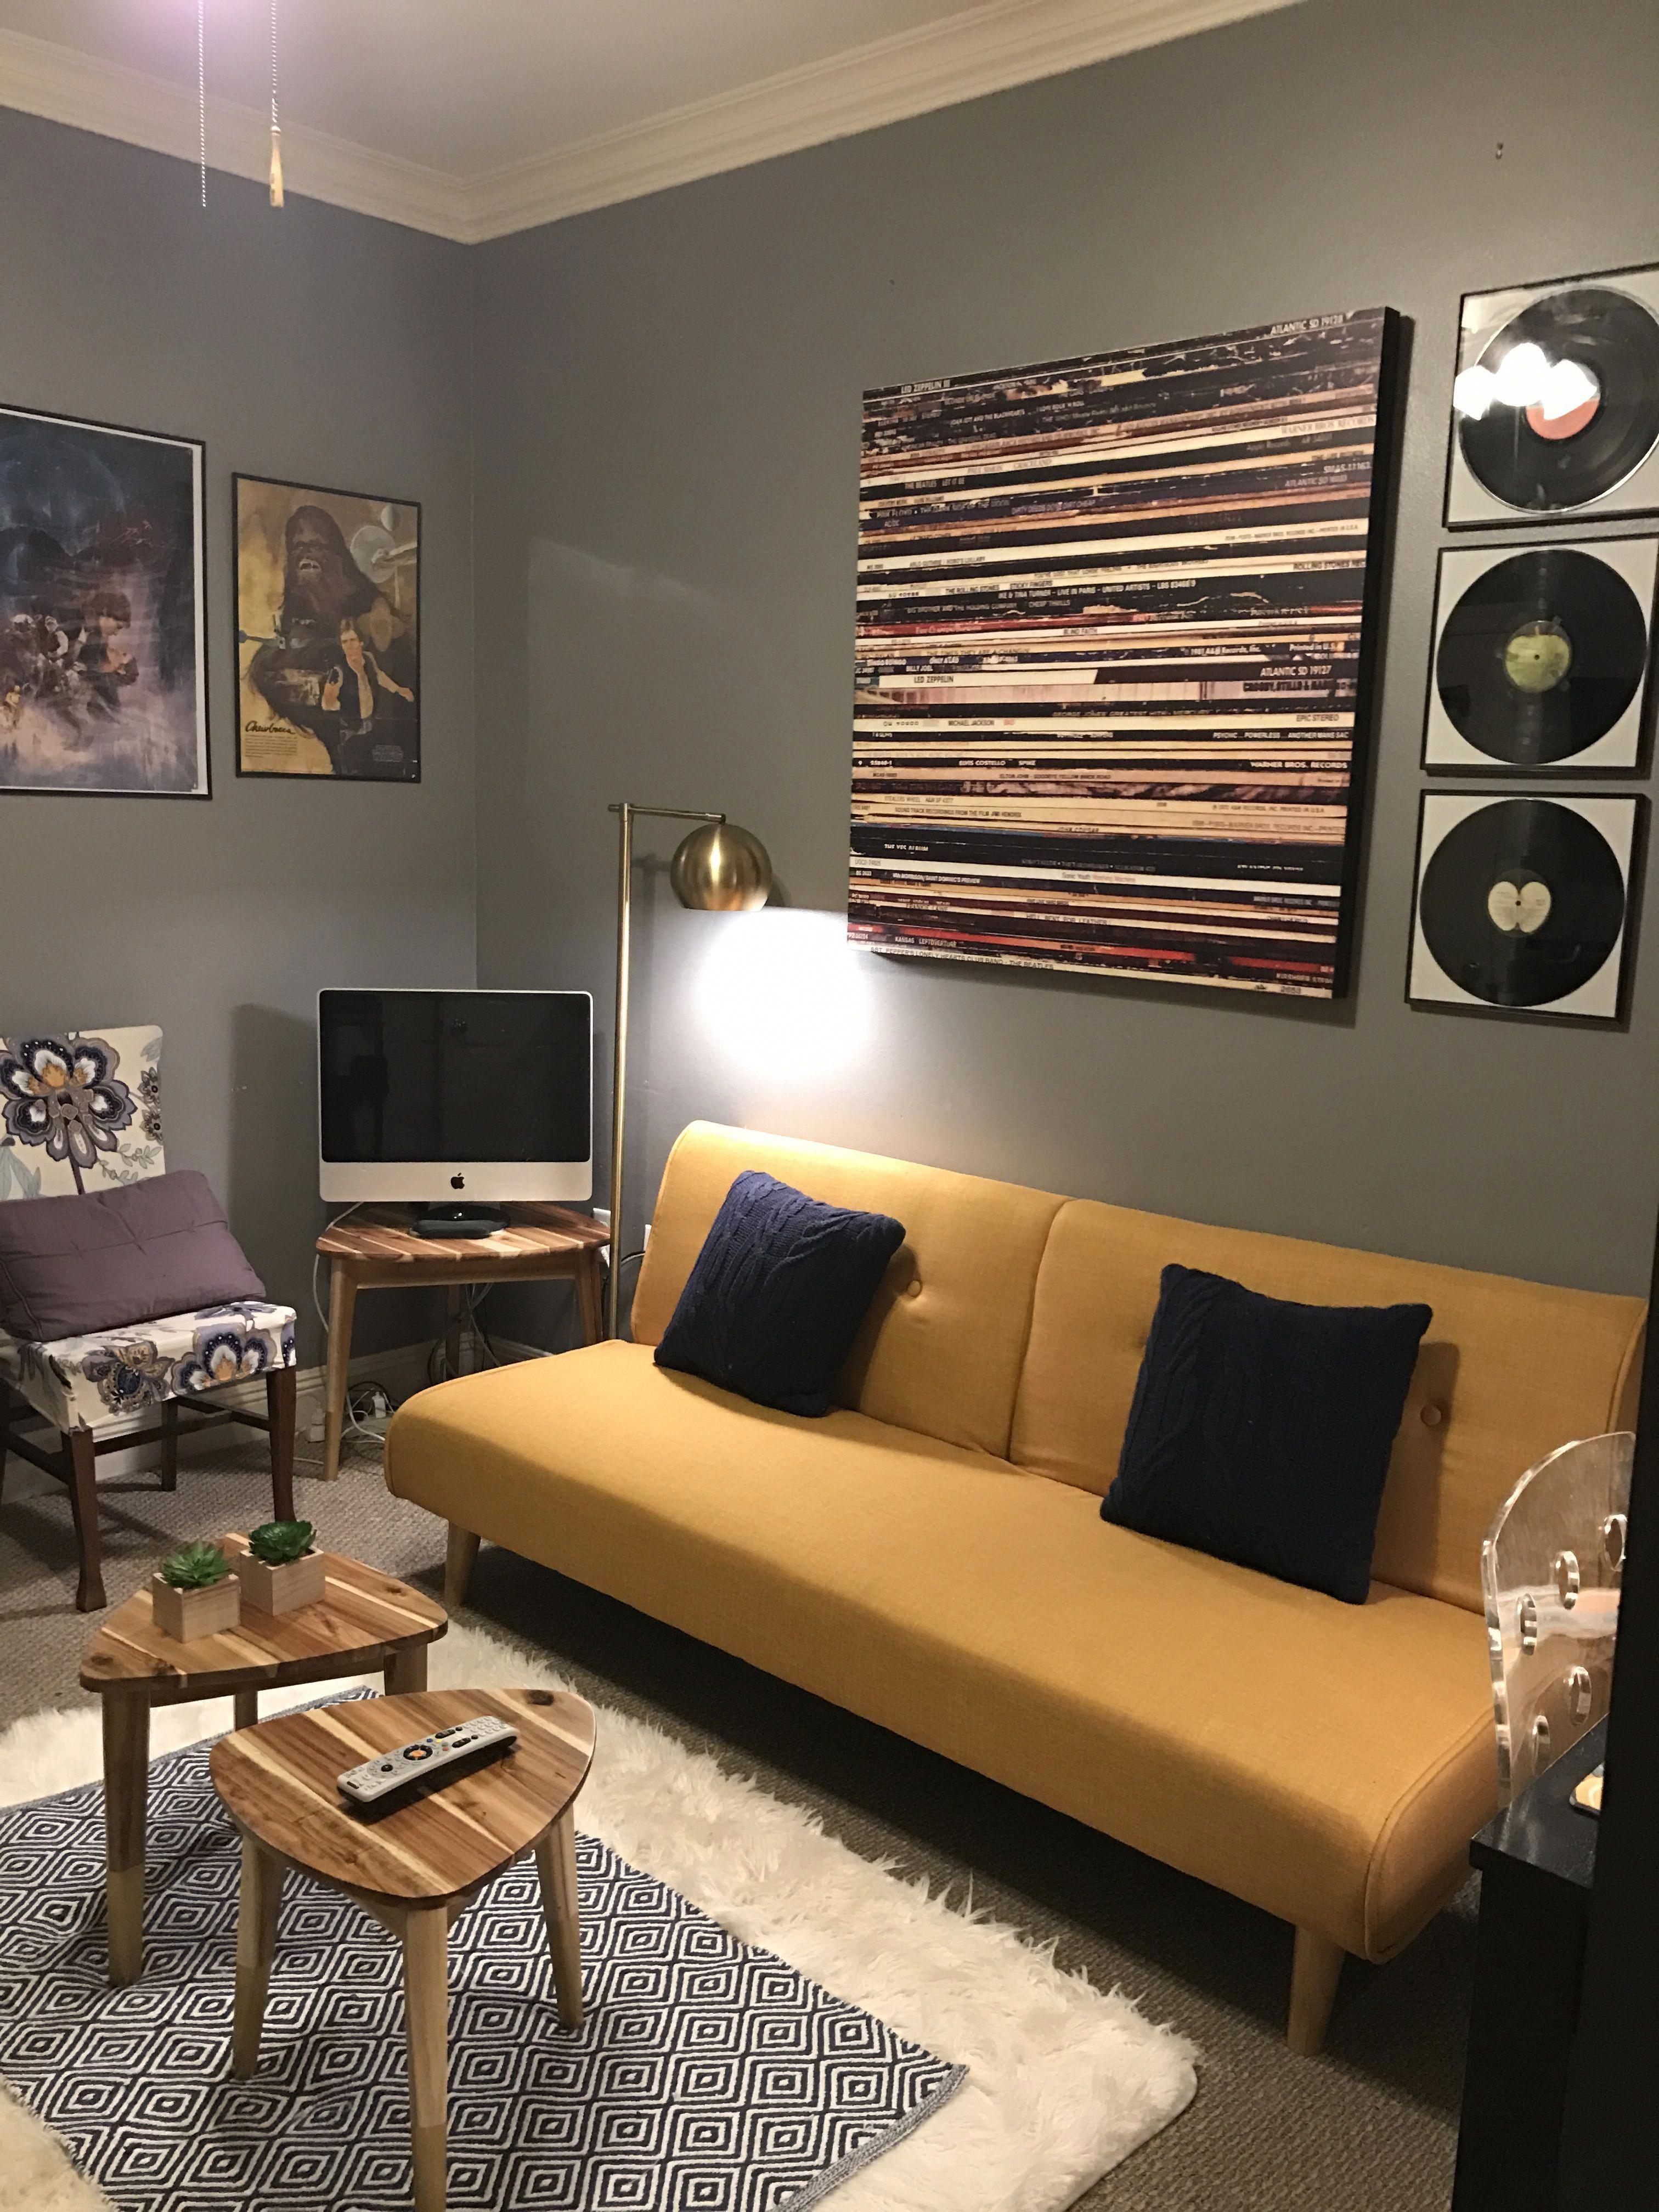 Amazon Com Dhp Emily Splitback Futon Black Furniture Decor Futon Living Room Couch Makeover Futon Living Room Ideas